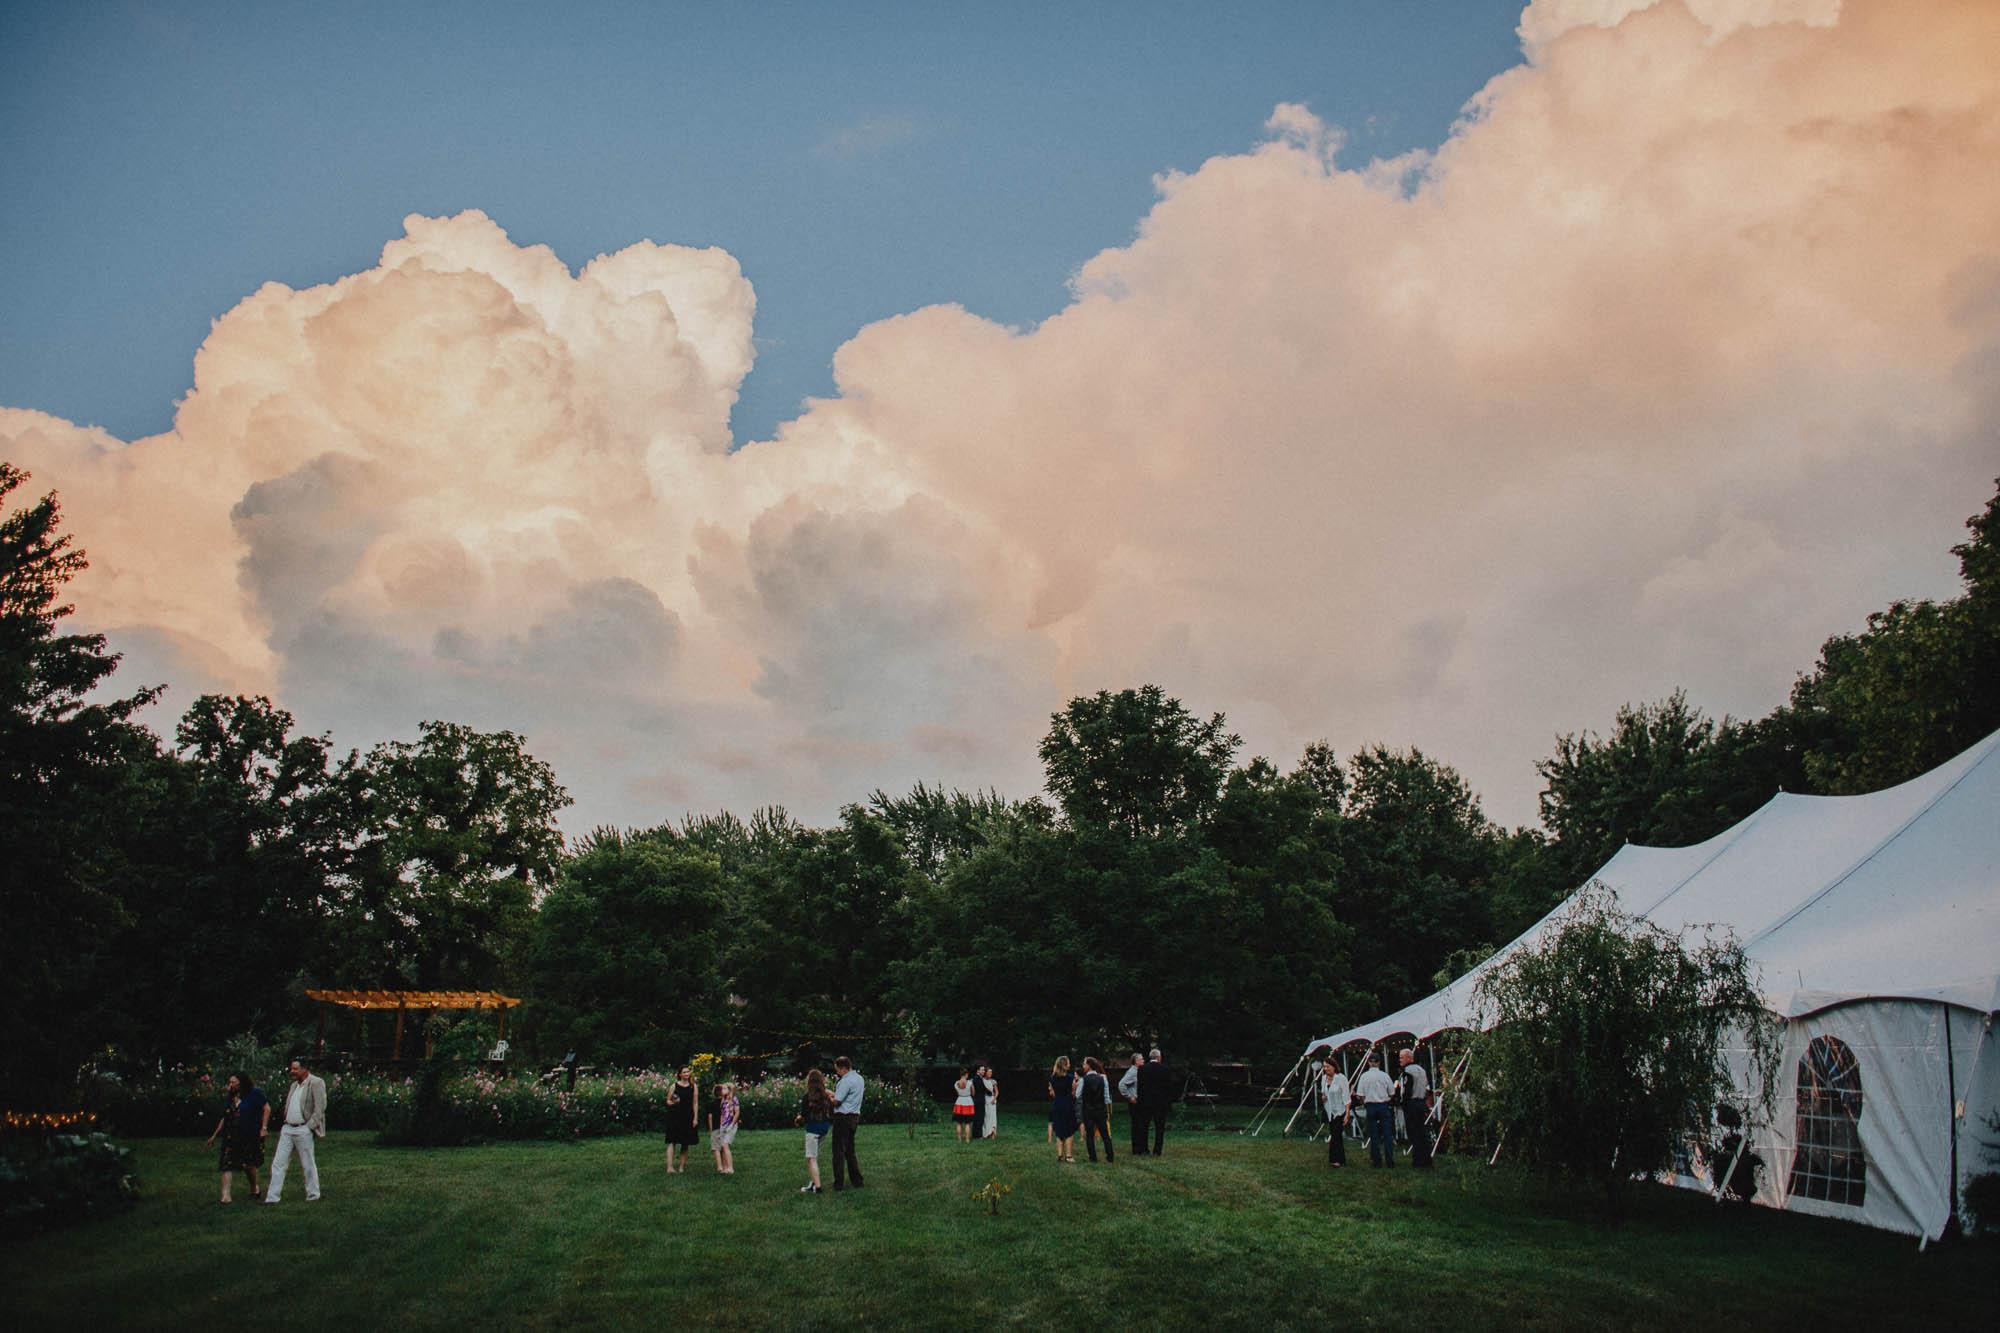 Leah-Graham-Michigan-Outdoor-DIY-Wedding-065@2x.jpg